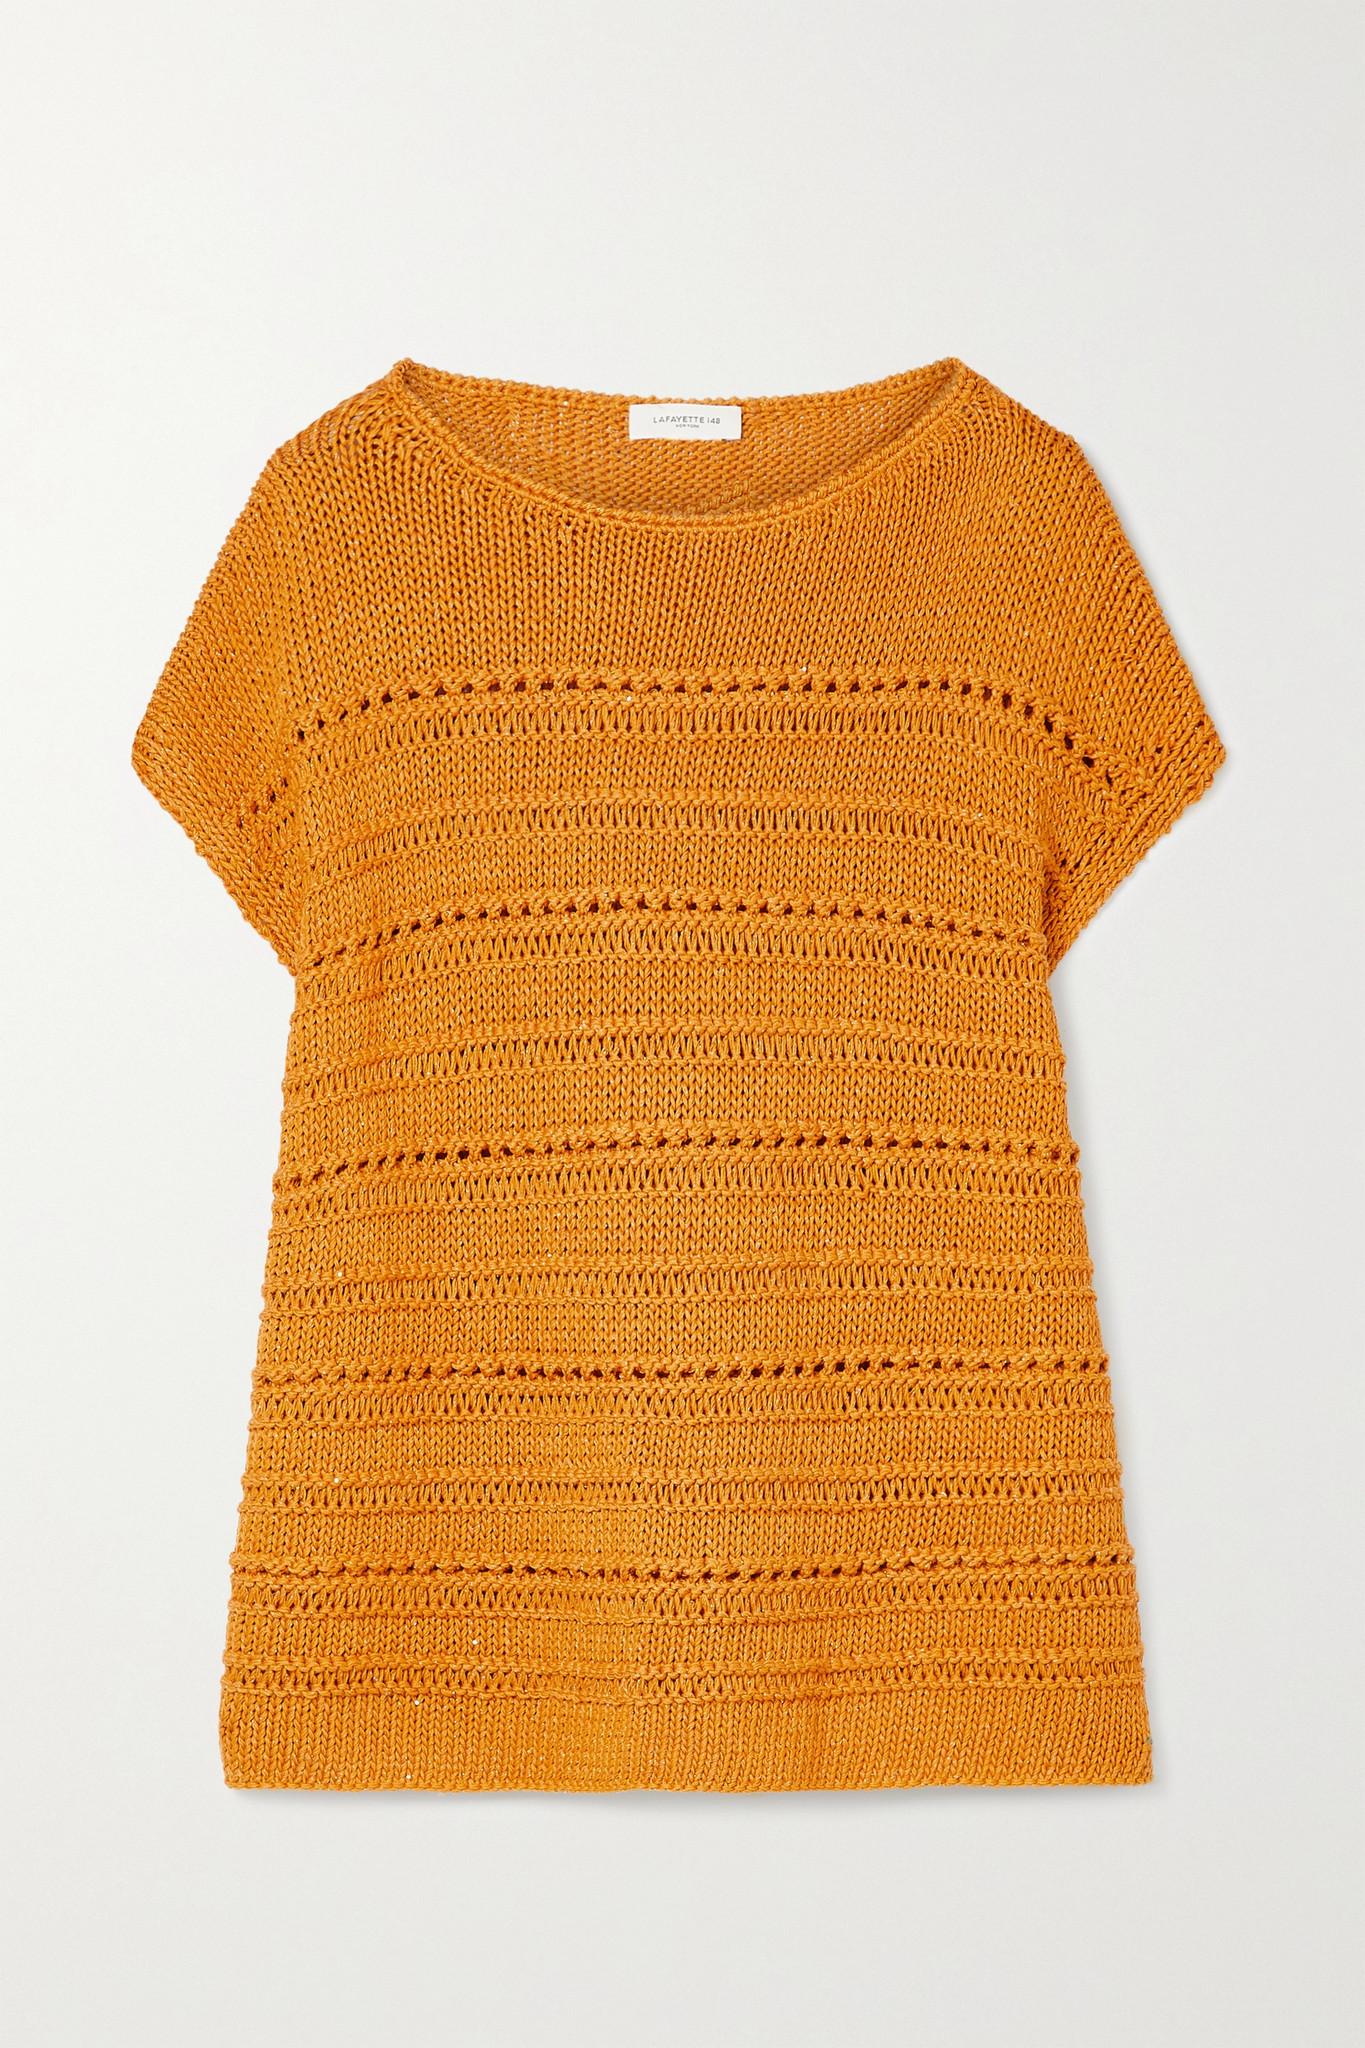 LAFAYETTE 148 - Sequin-embellished Open-knit Cotton-blend Sweater - Orange - xx small